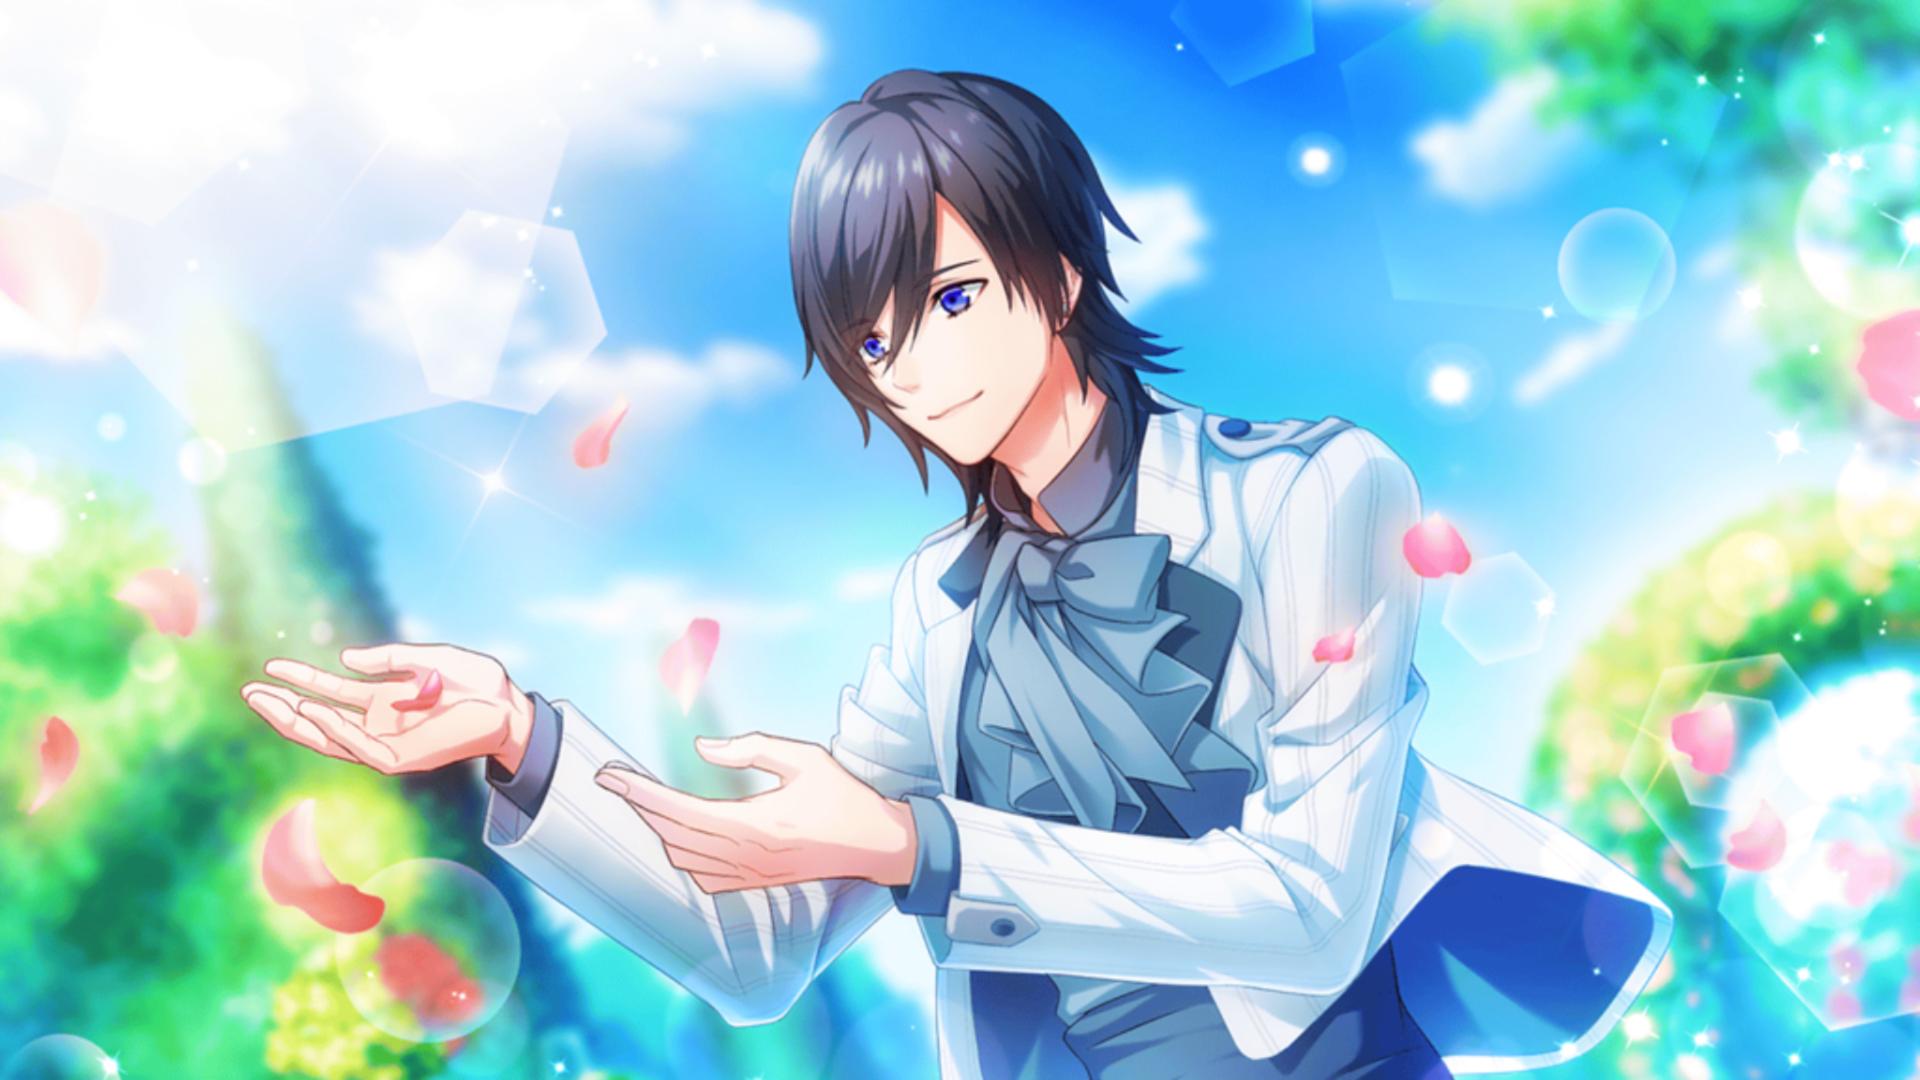 【Flower Garden】Yuduki Teramitsu Awaken Full.png